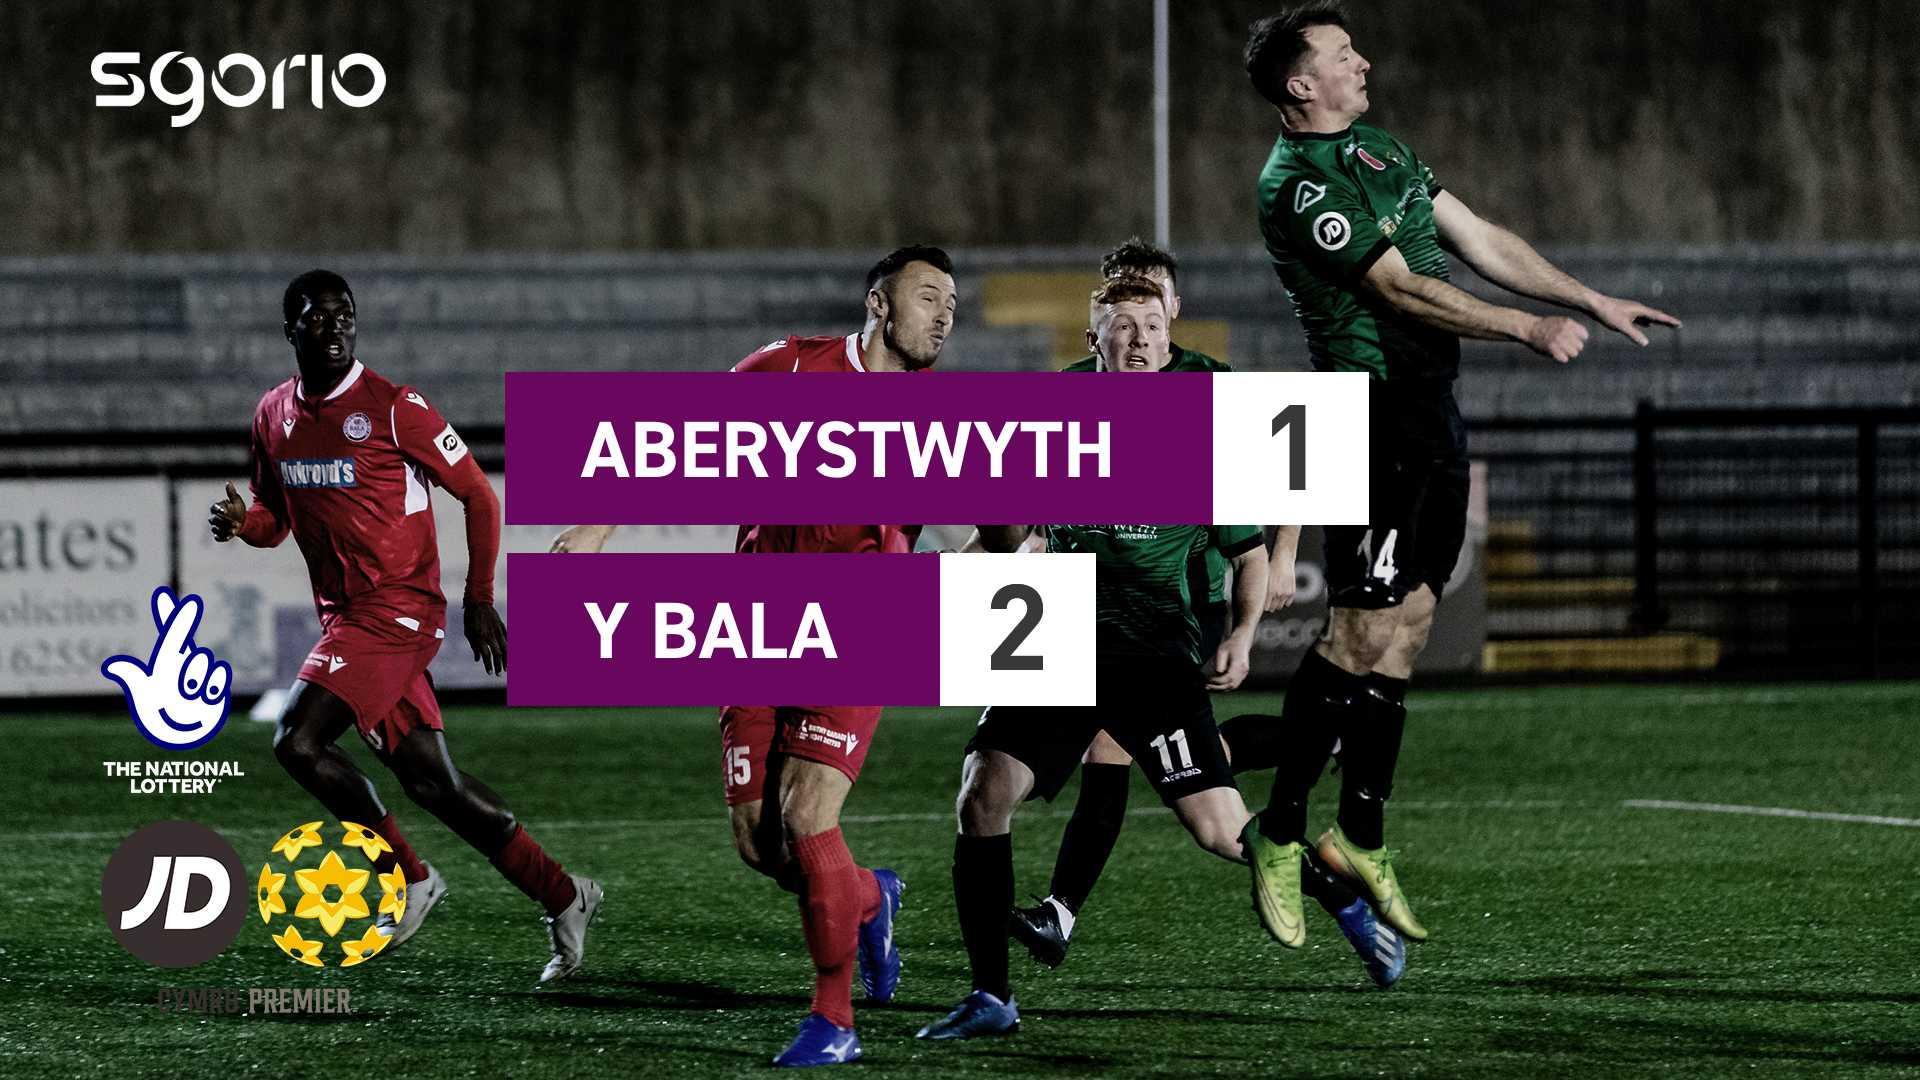 Aberystwyth Town 1-2 Bala Town